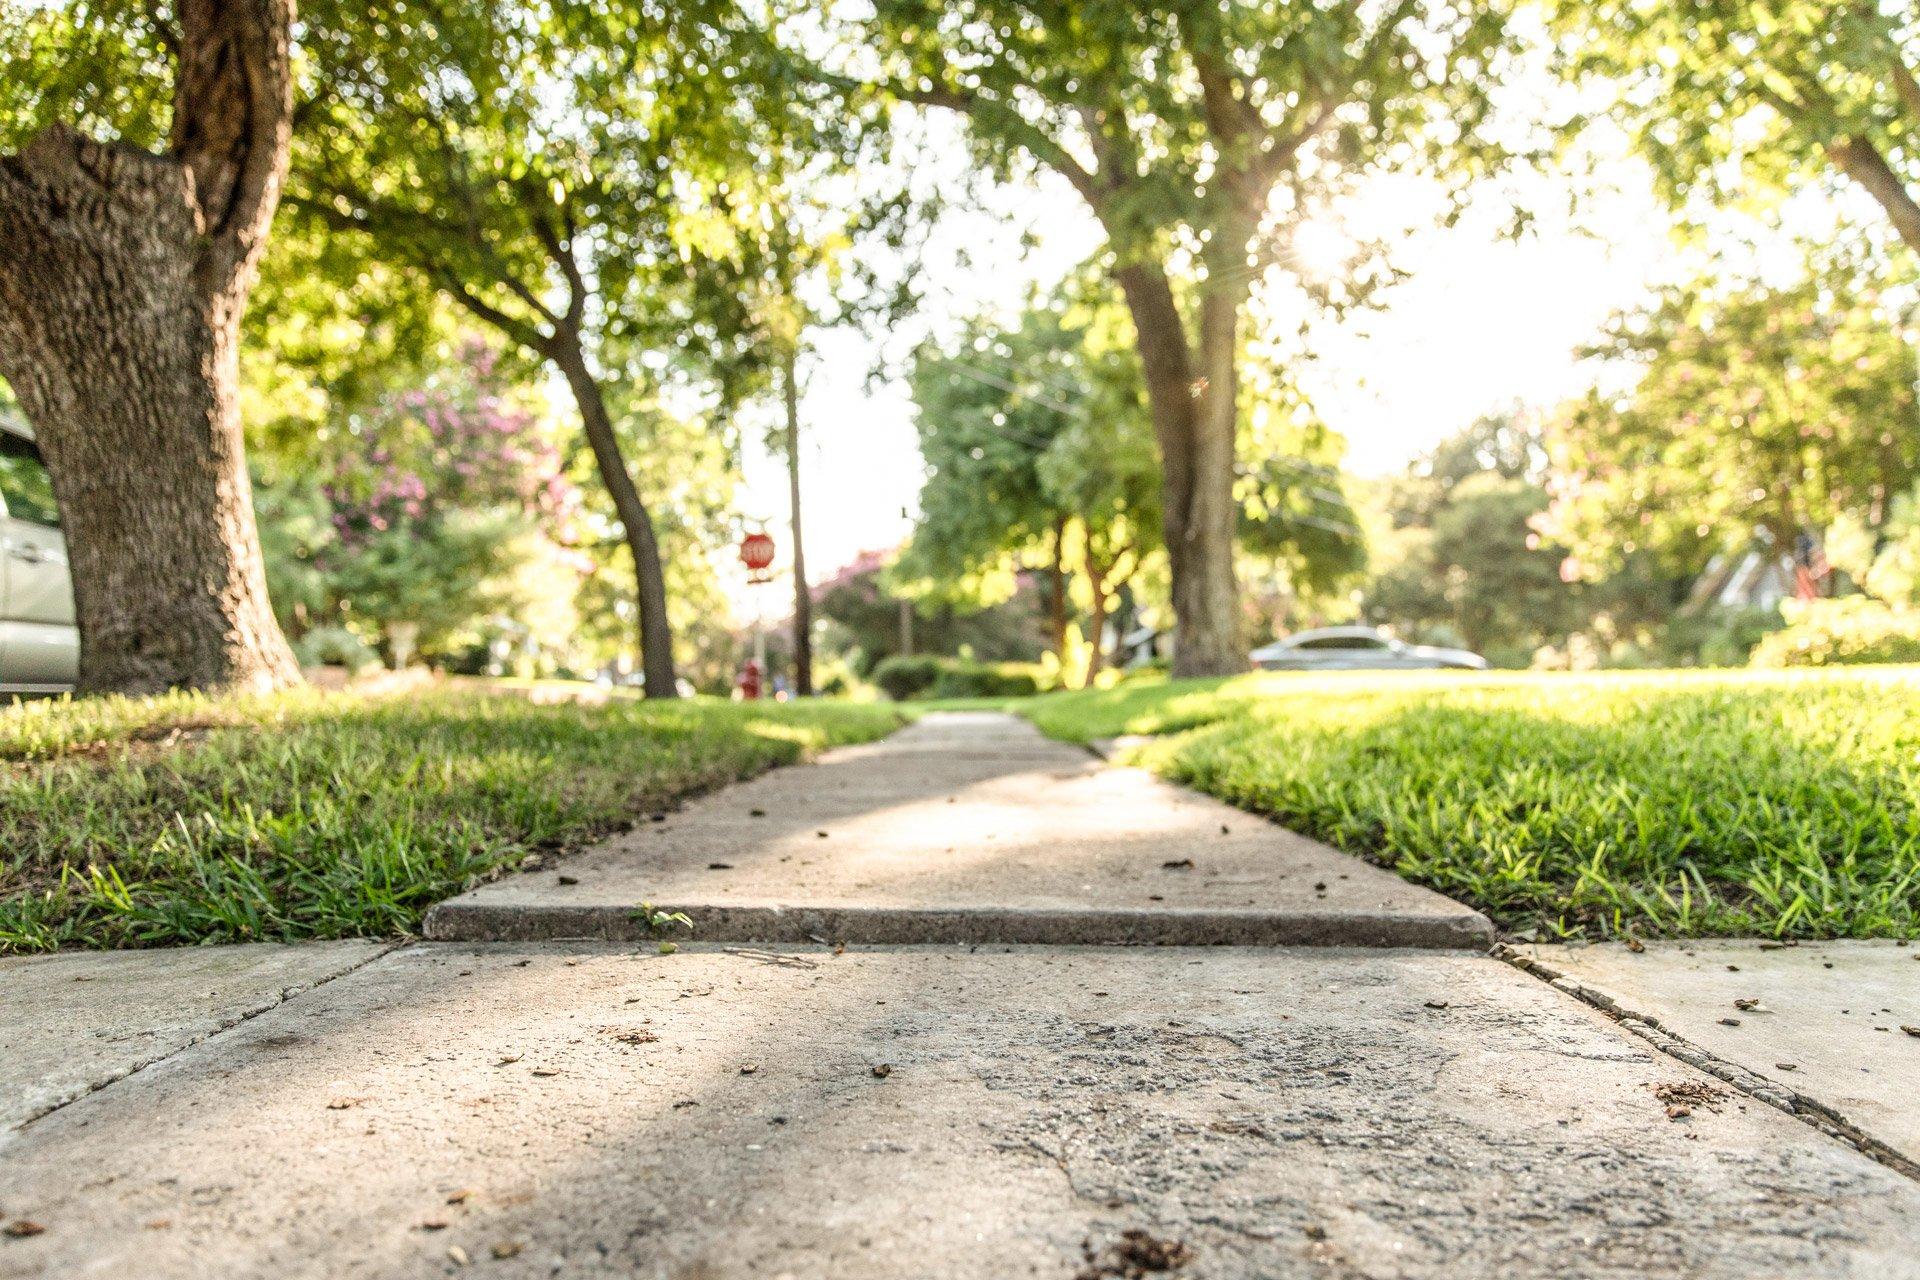 Sunken sidewalk example